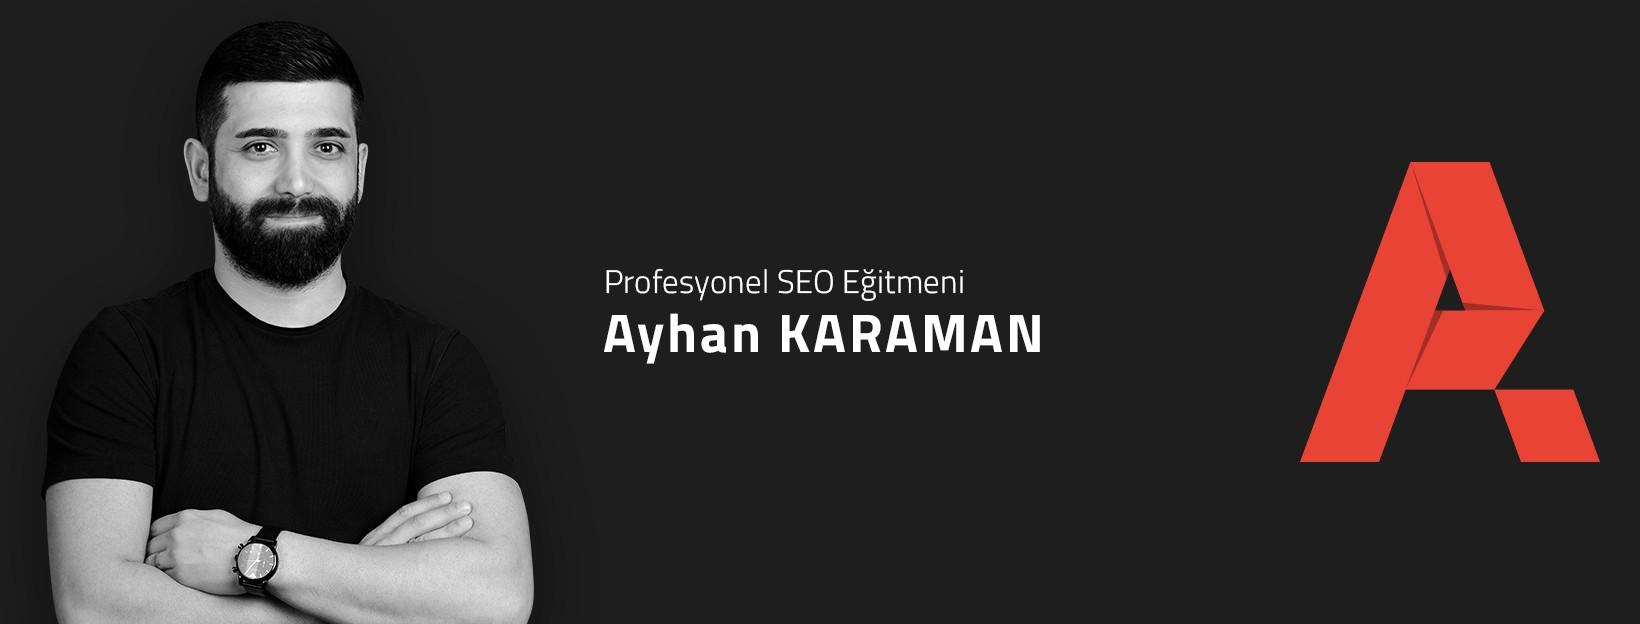 Profesyonel SEO Eğitmeni Ayhan KARAMAN